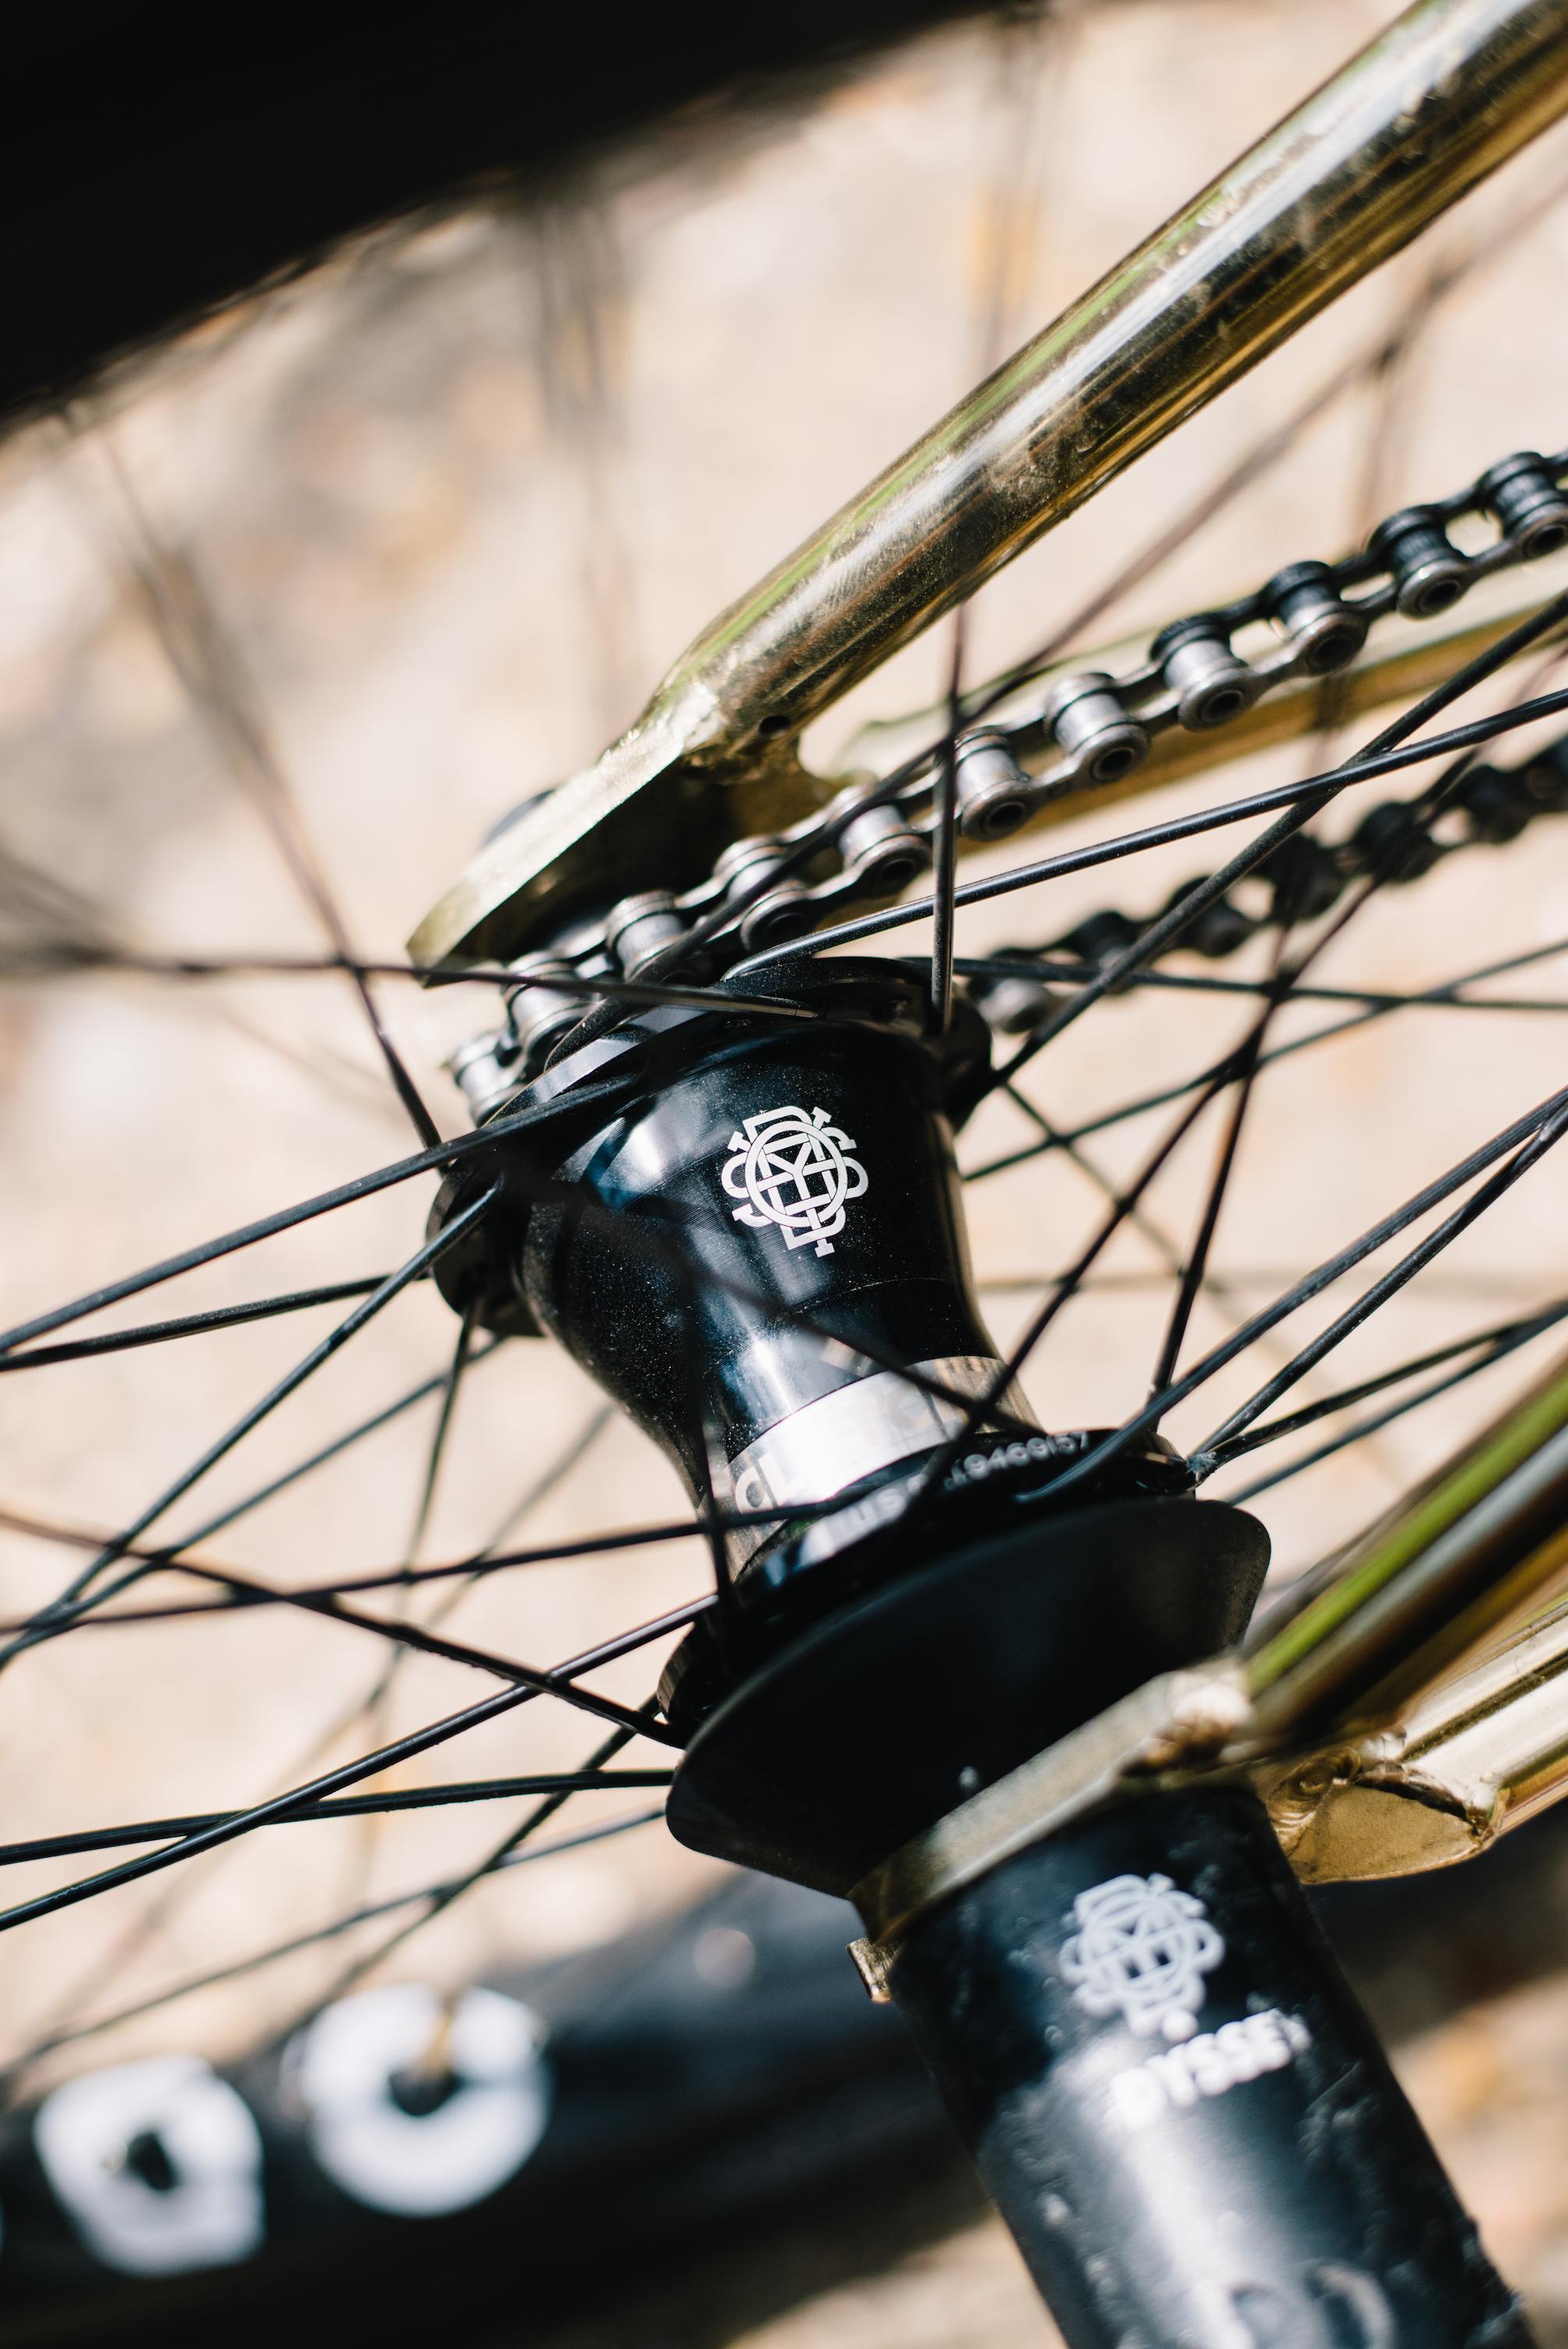 181128 Austin Brunger bike check KIRBY HALF RES_13.jpg